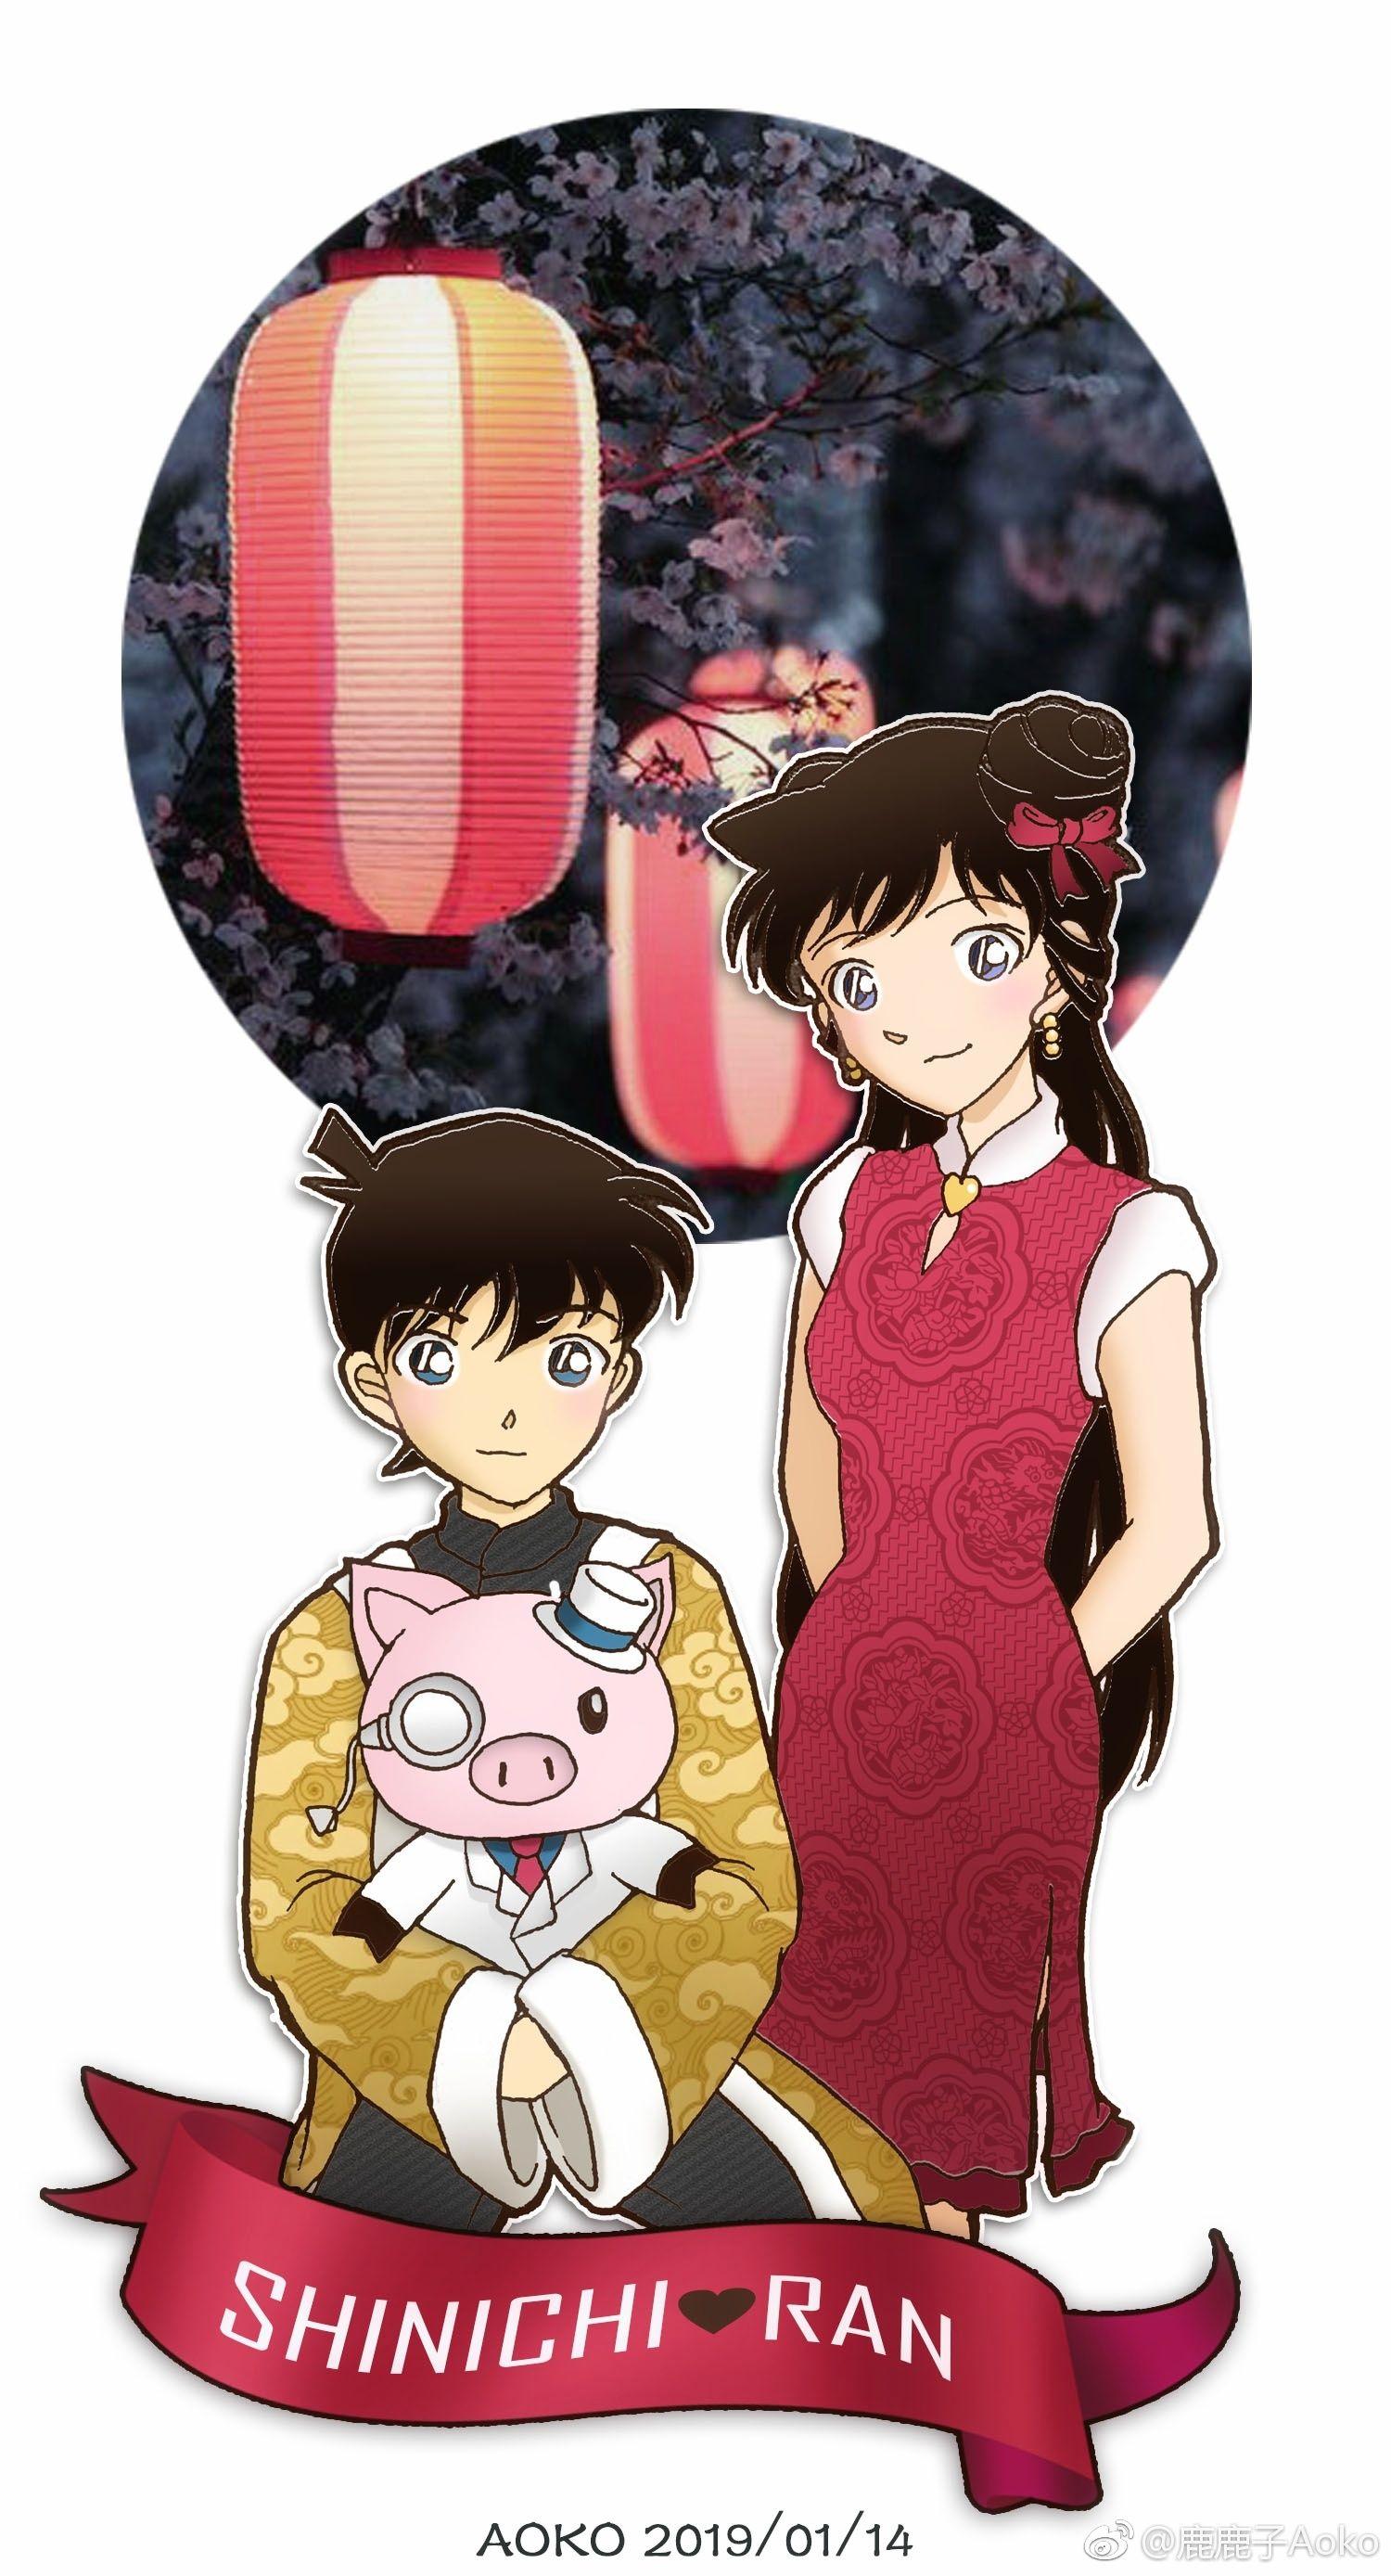 Shinichi & Ran celebrate 2019, the Year of the Pig. Kaito